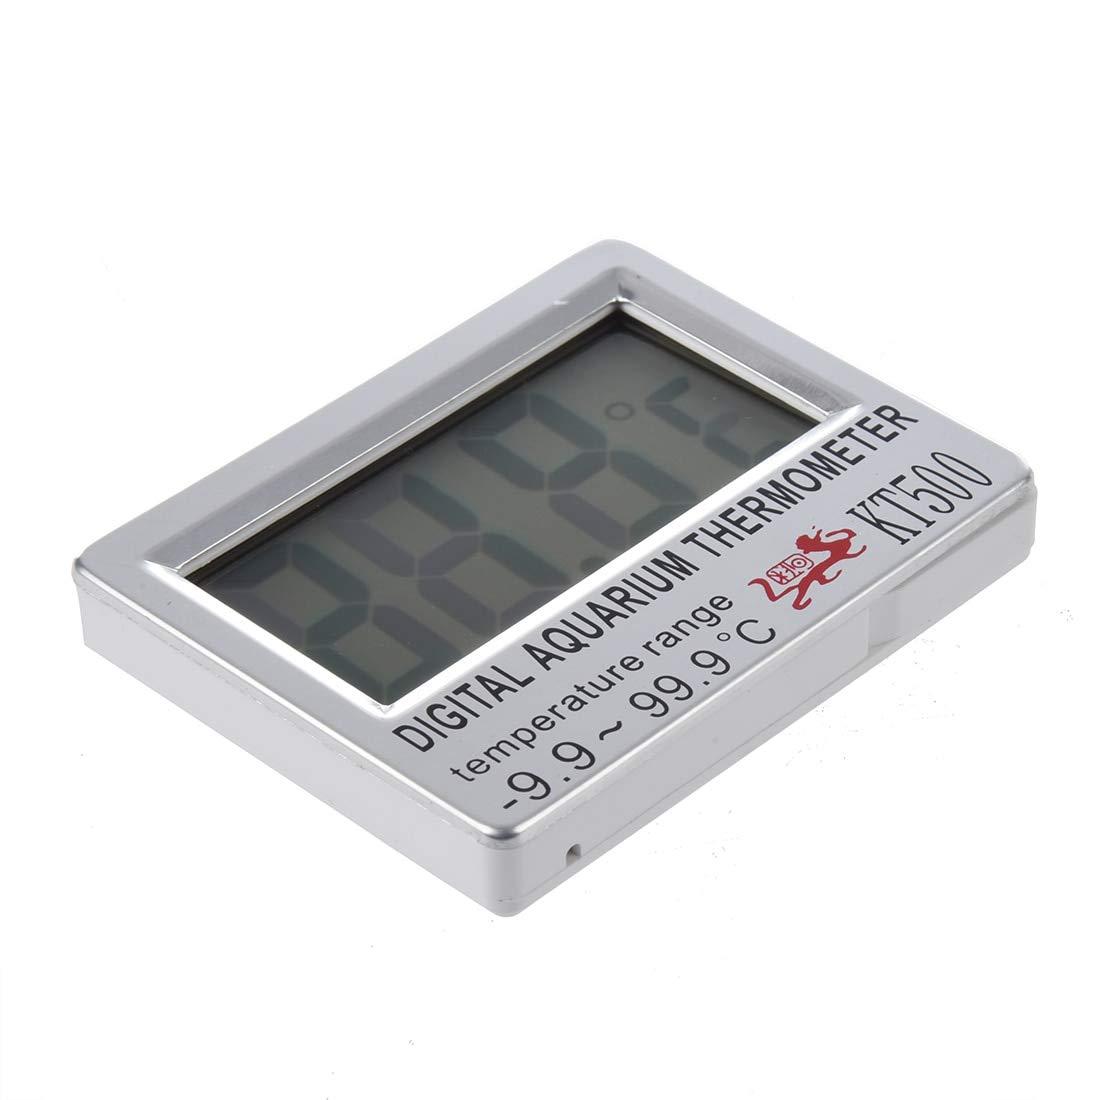 Ants-Store - Digital LCD Aquarium Fish Tank Vivarium Meter Thermometer by Ants-Store (Image #3)